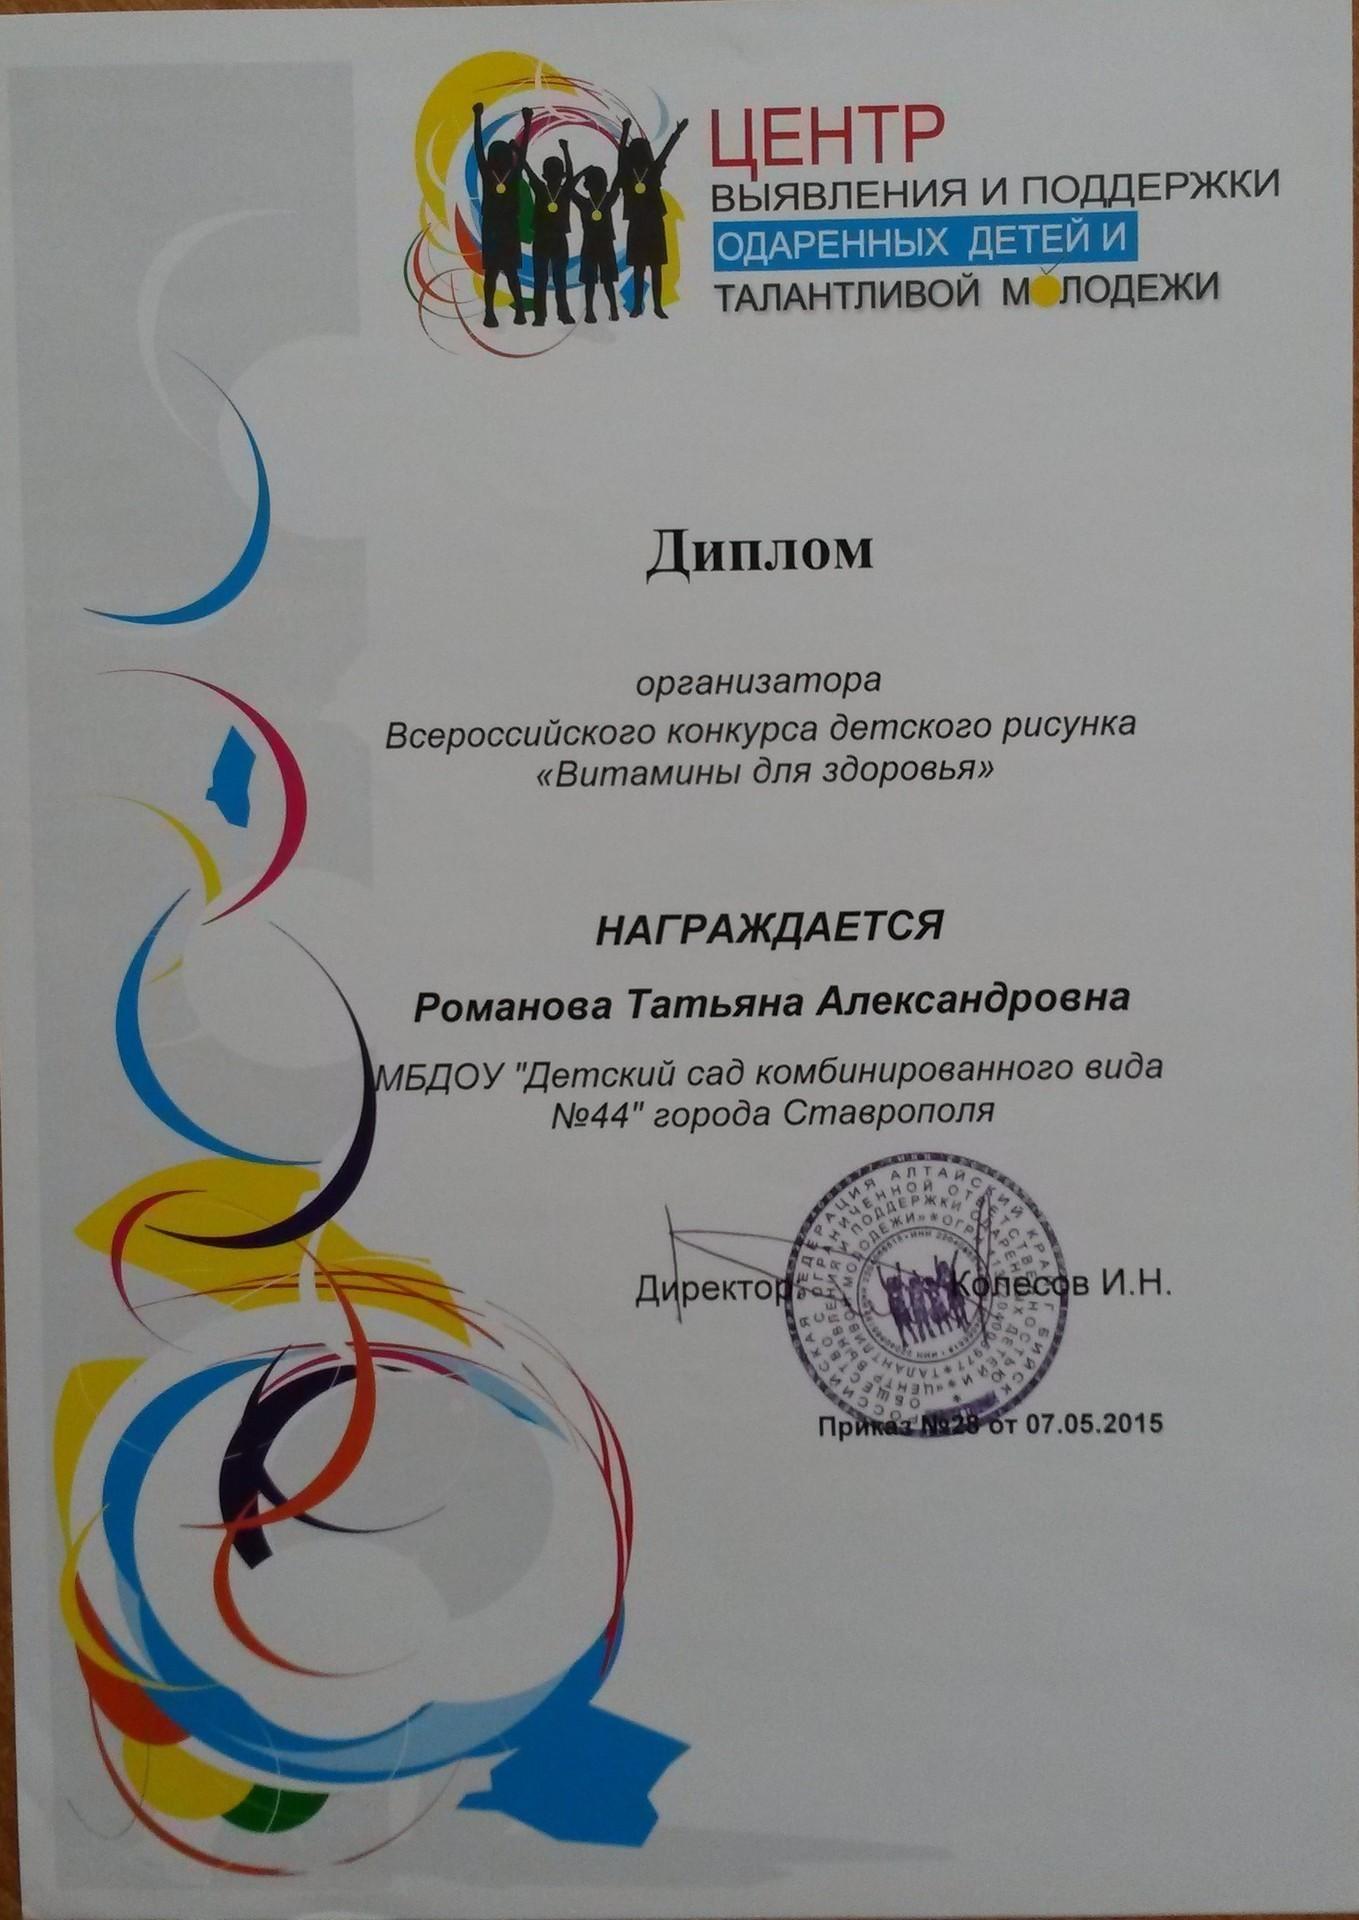 20170329_105300